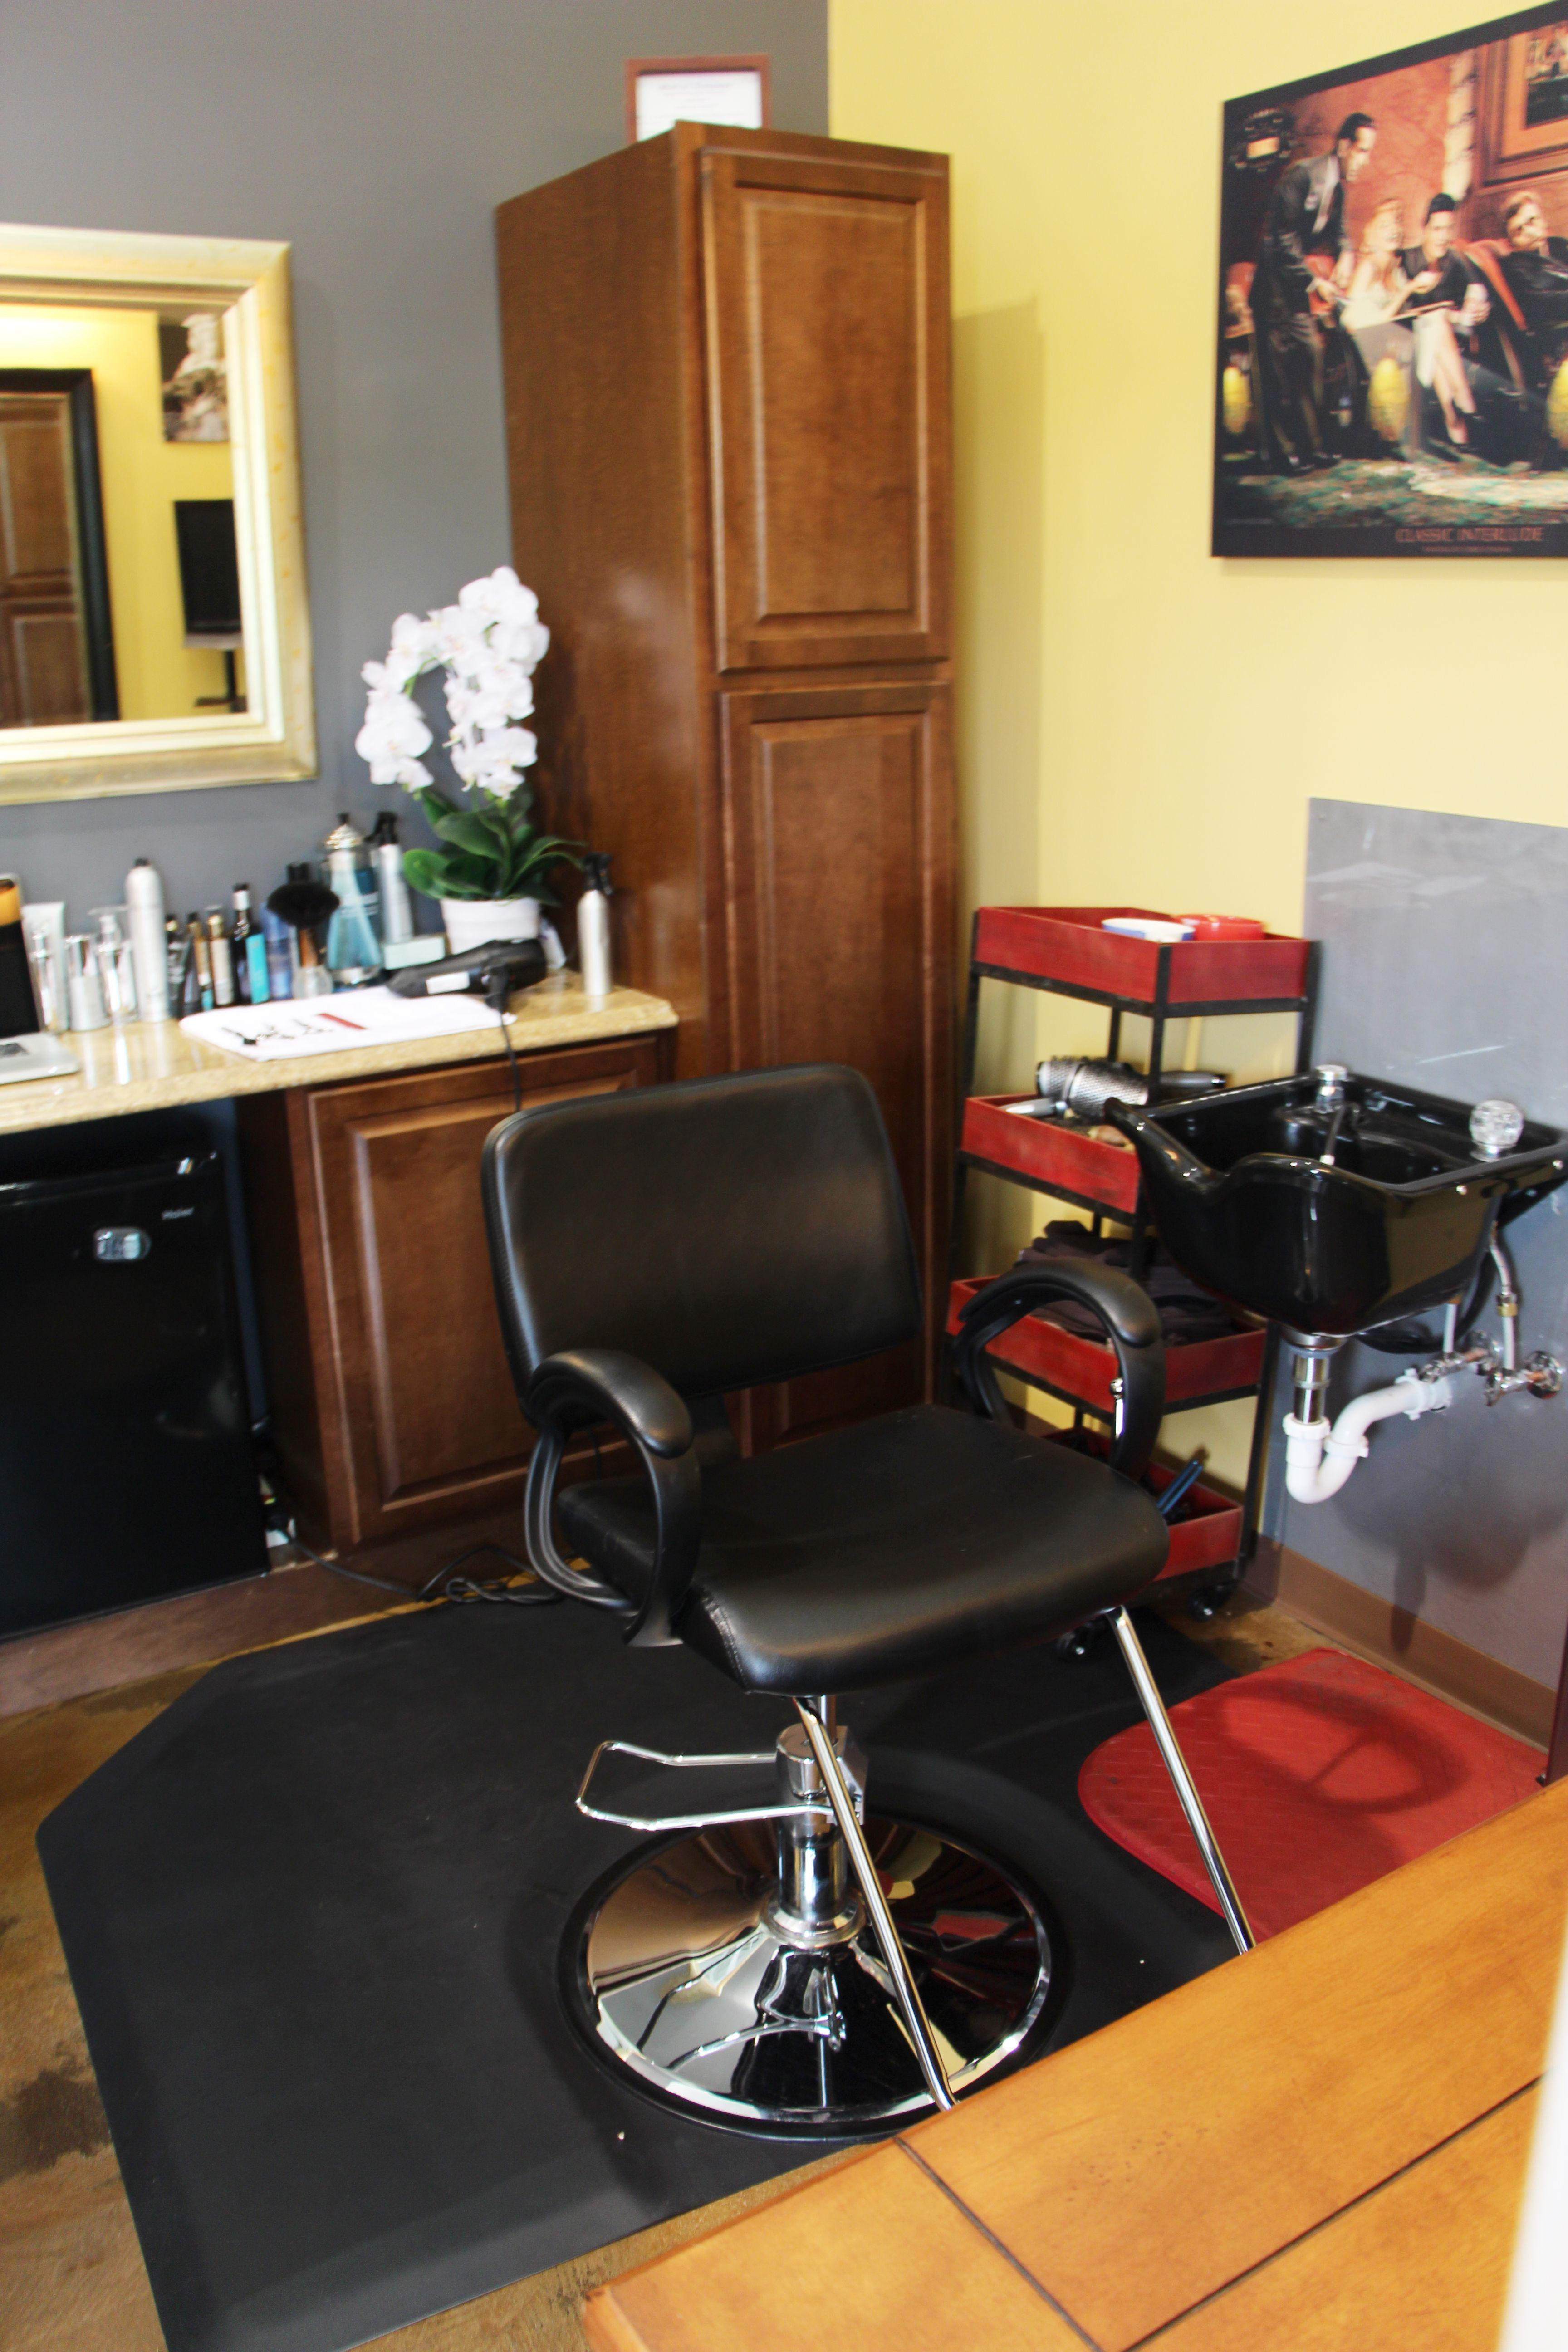 Whitneys Salon In Studios West Salon Suites In Knoxville #whitneyssalon